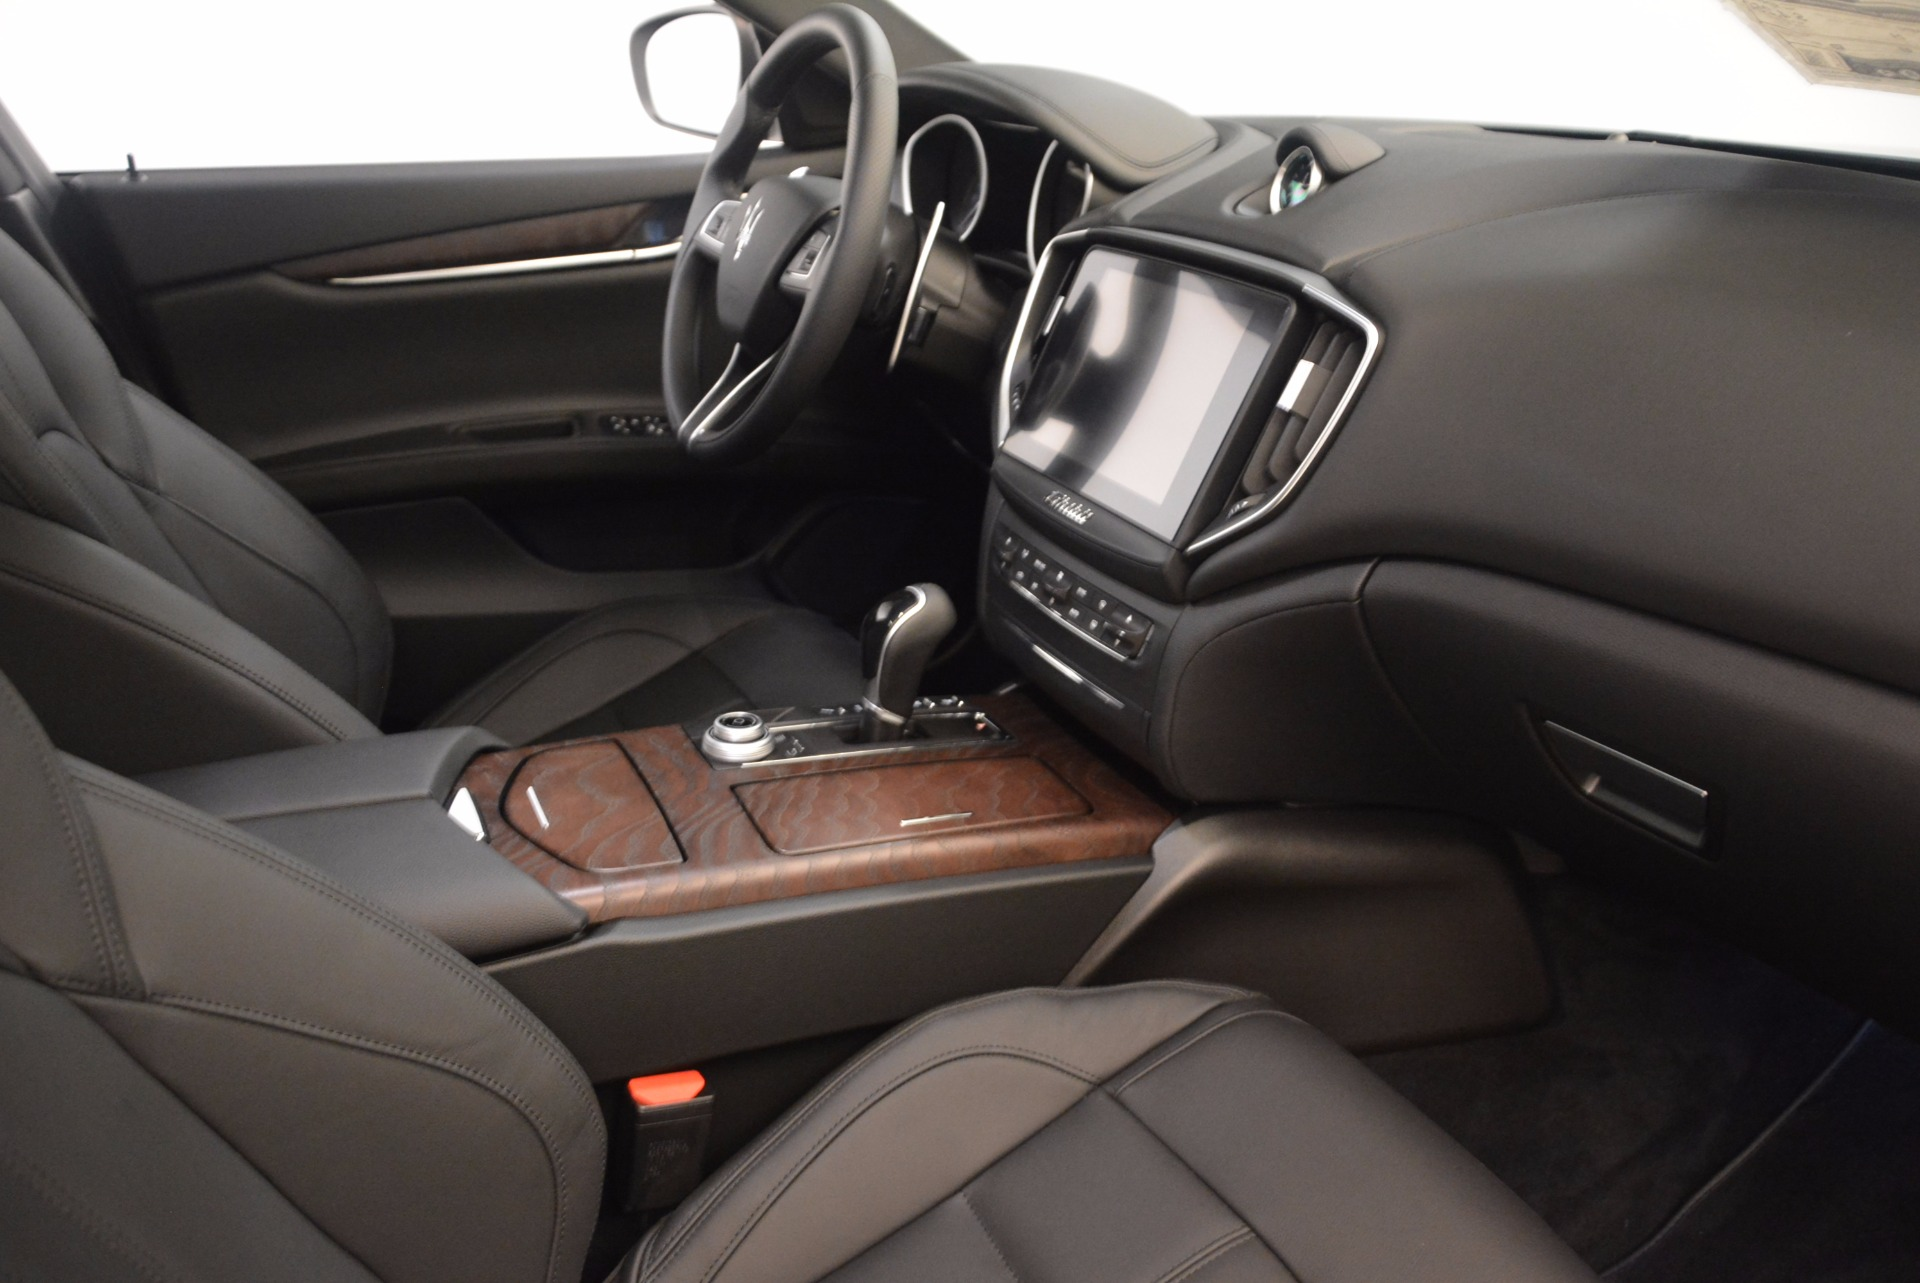 Used 2018 Maserati Ghibli S Q4 Gransport For Sale In Westport, CT 1568_p17